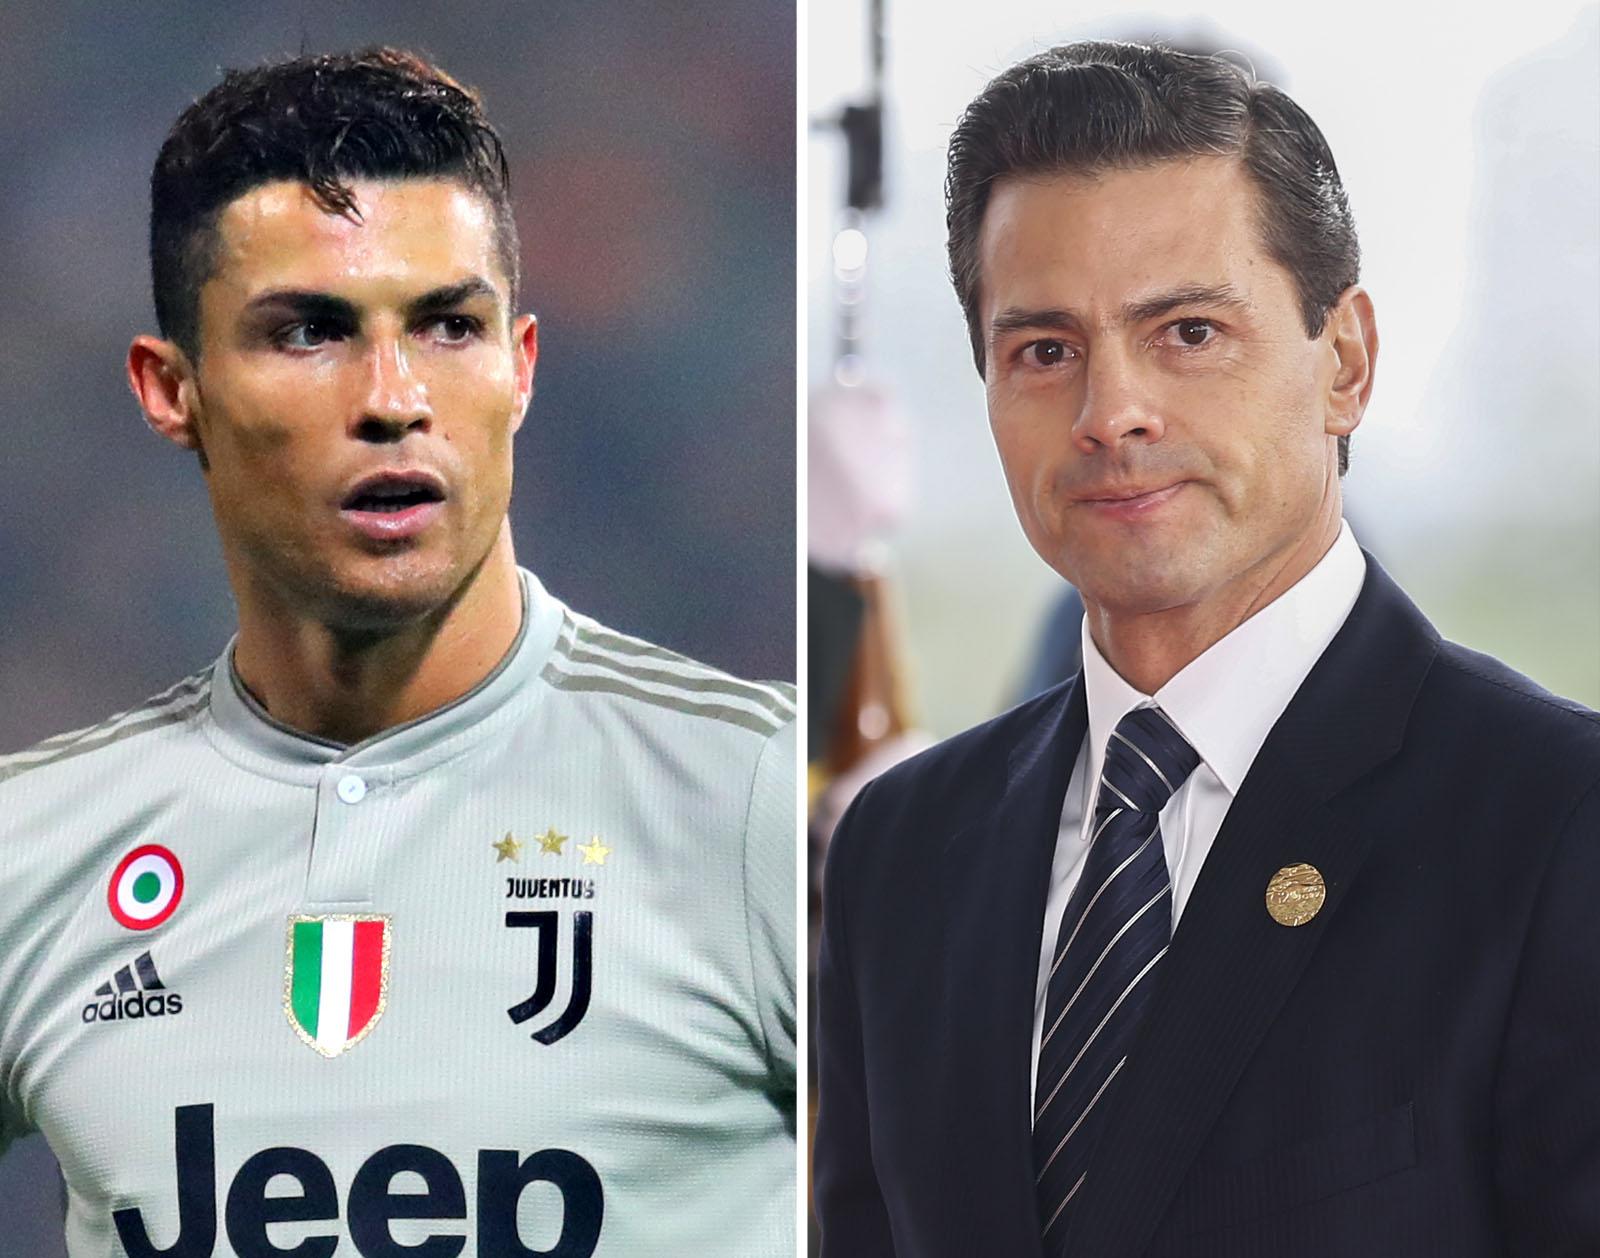 Cristiano Ronaldo Enrique Peña Nieto